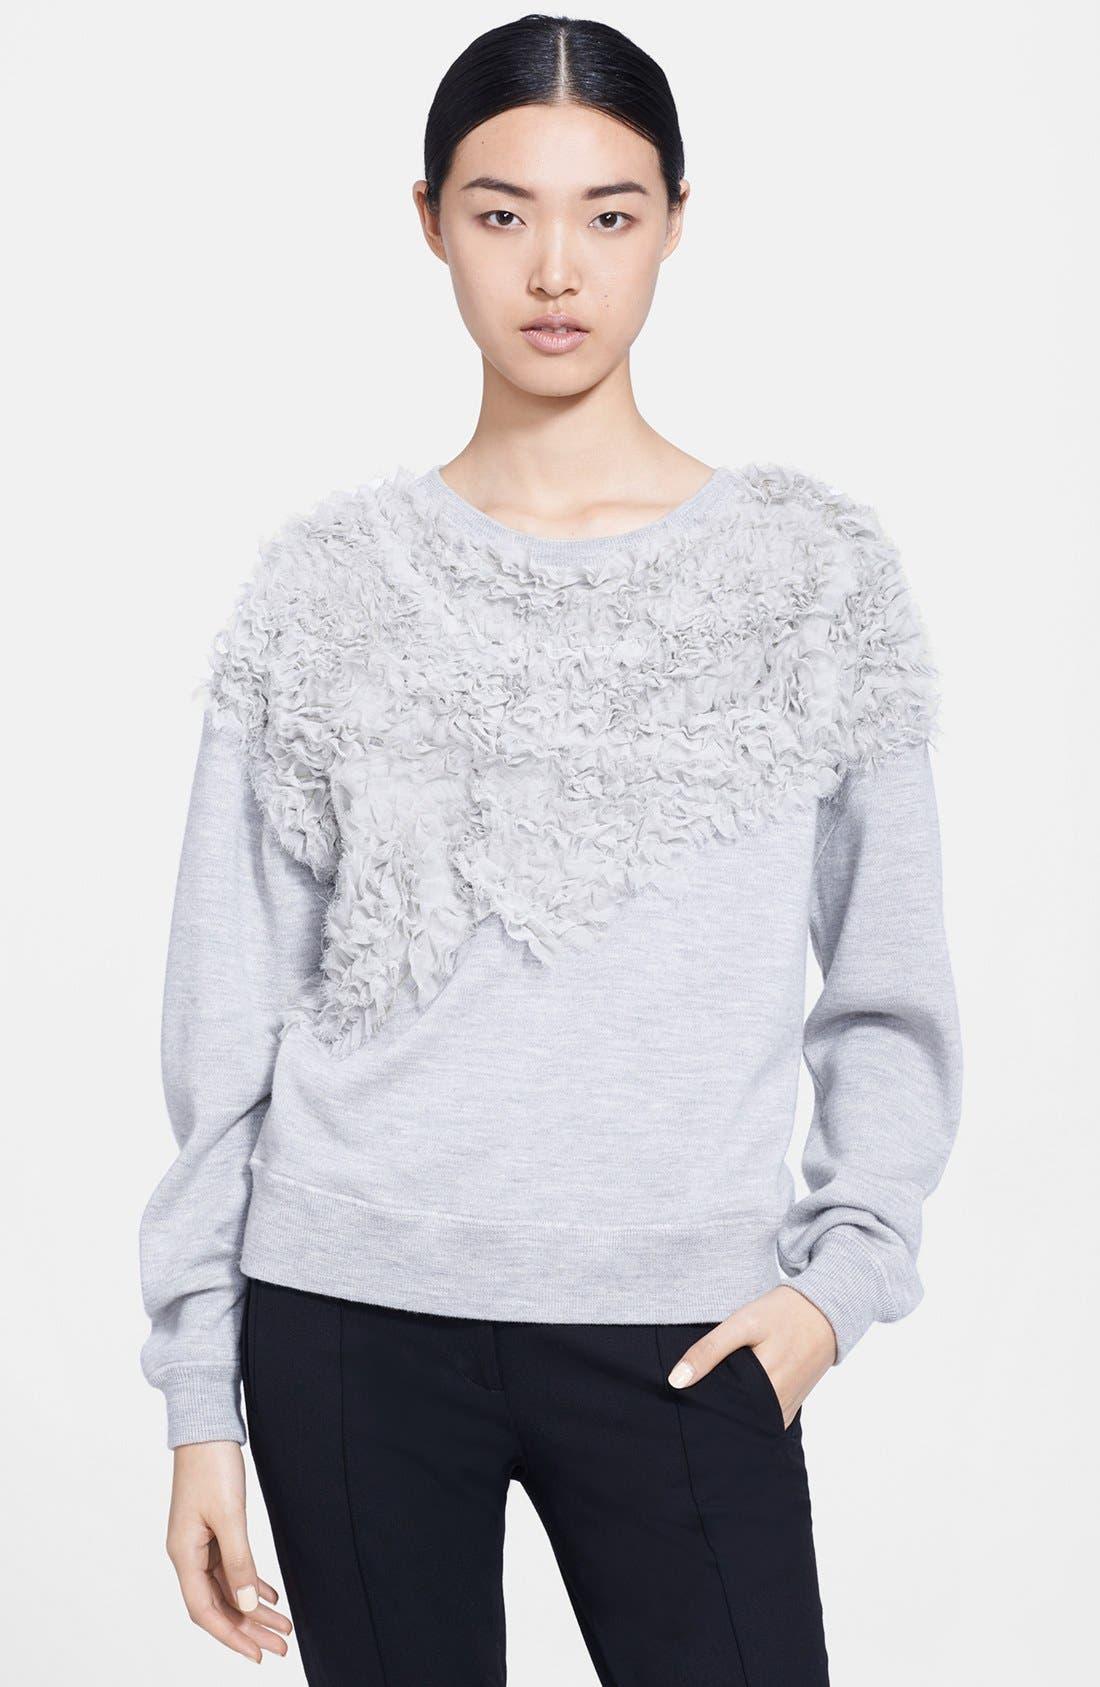 Alternate Image 1 Selected - Jason Wu Chiffon Appliqué Sweatshirt